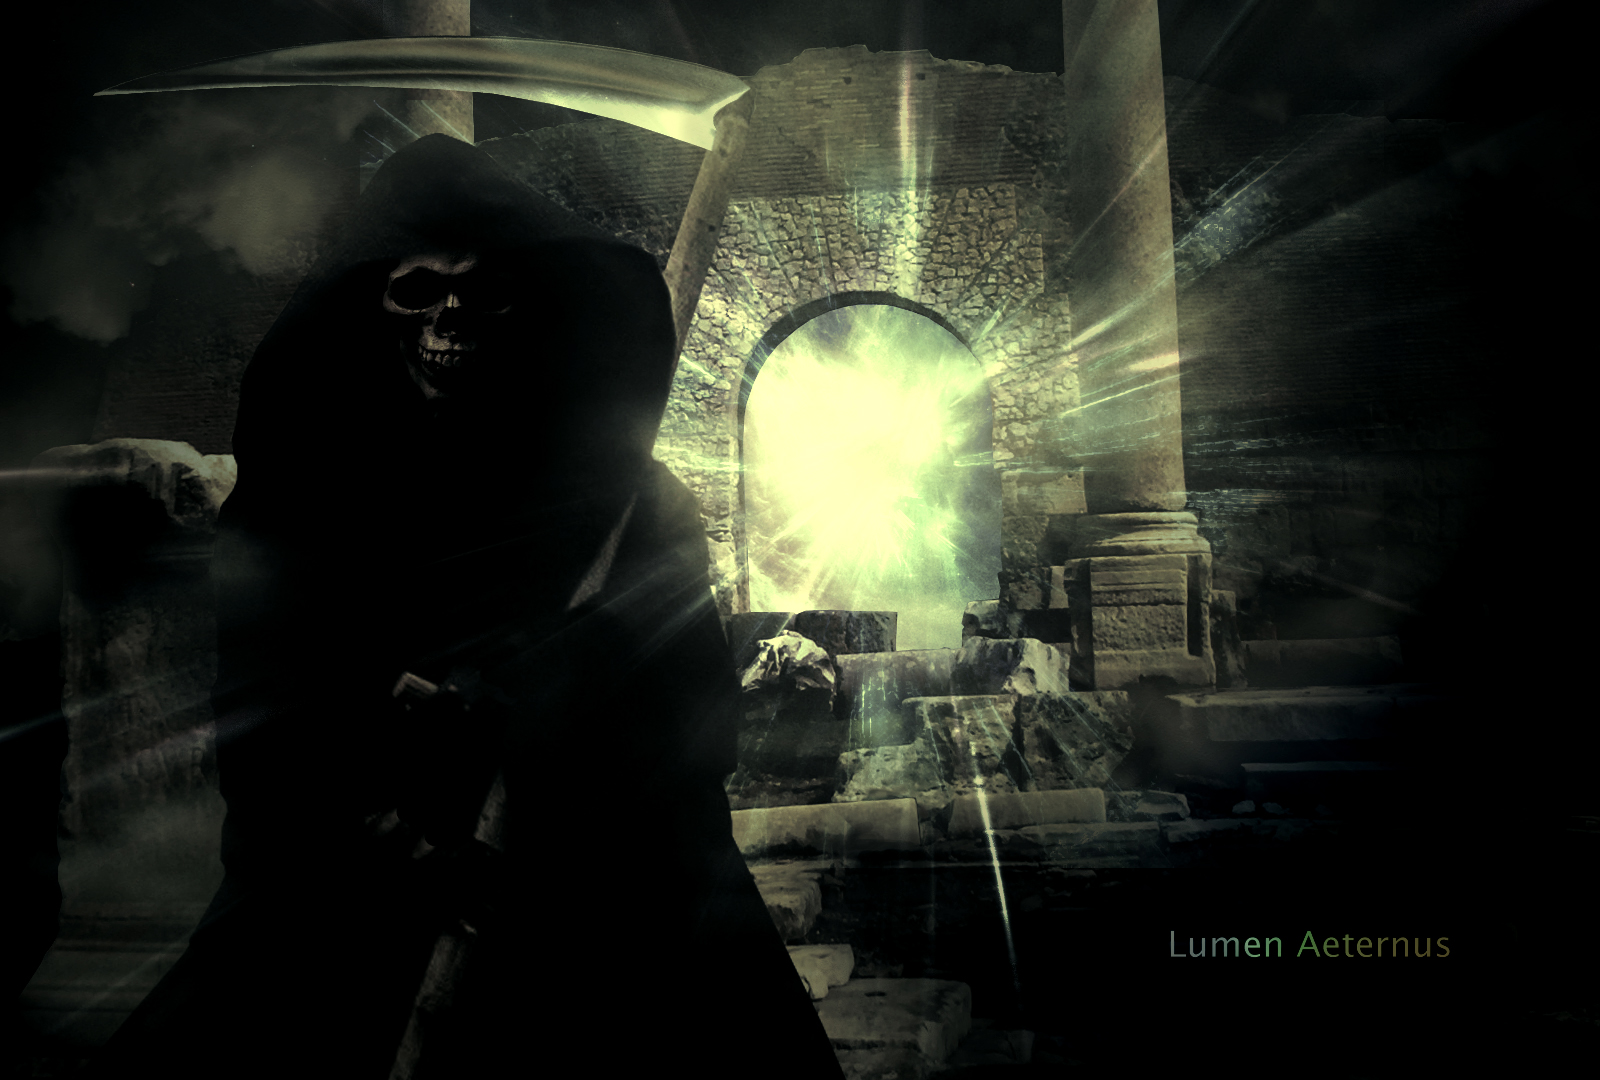 Lumen Aeternus by MaraudingMaster